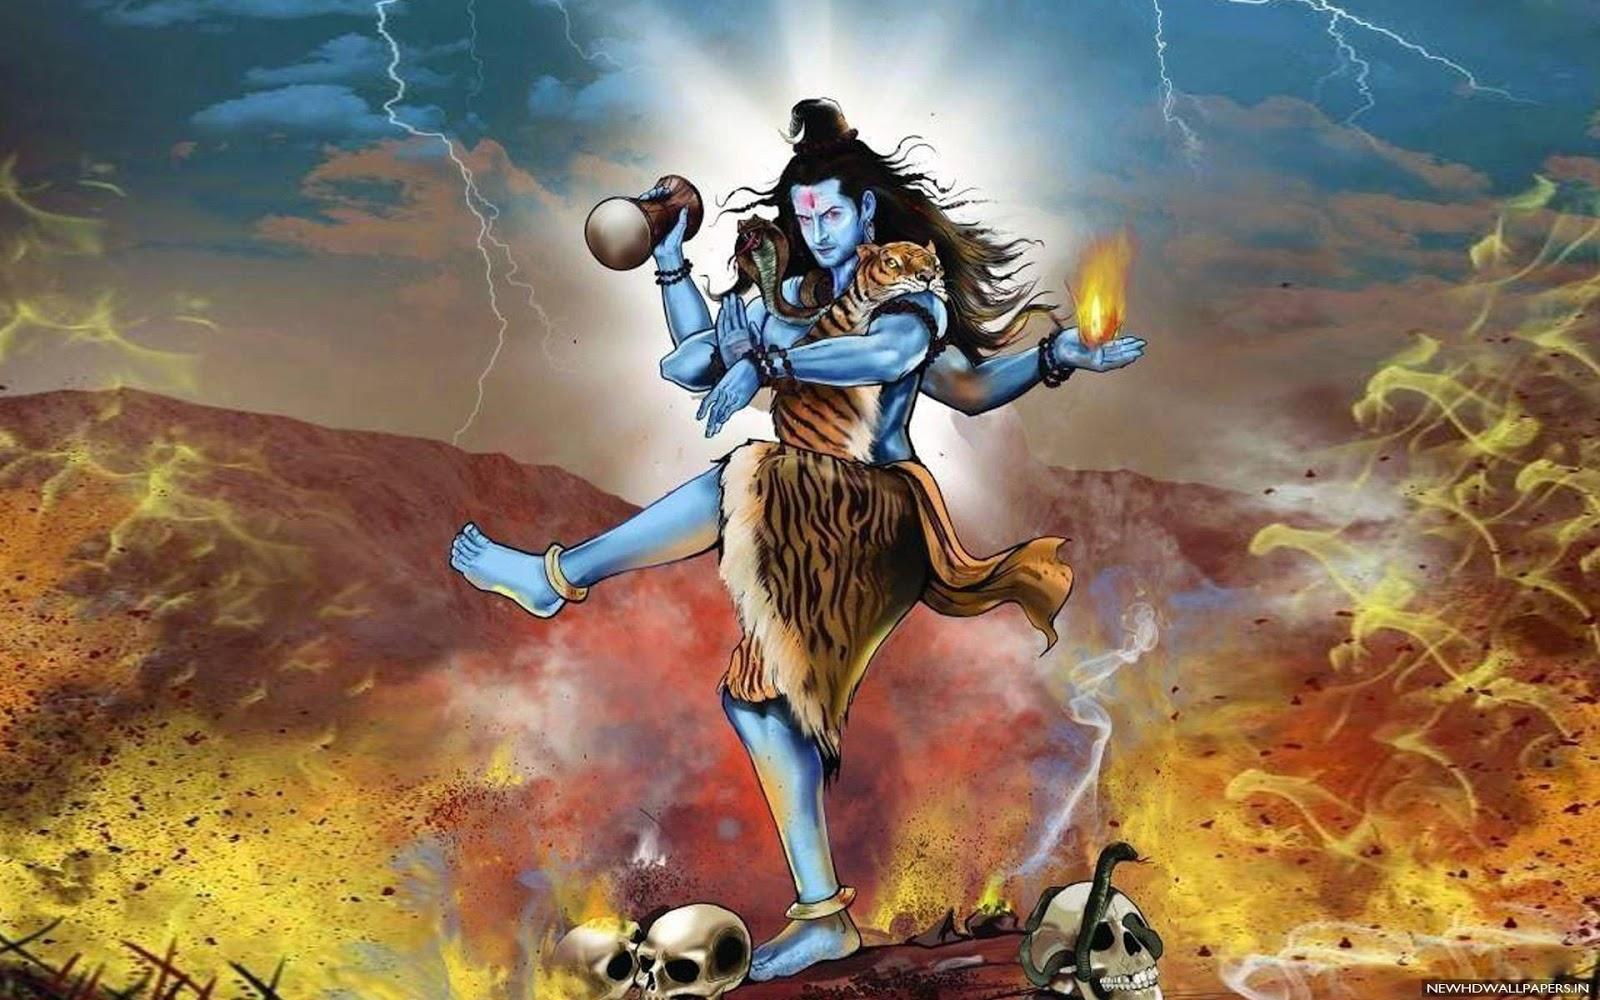 ANDHRA PRADESH: (West) GodhAvari District Lord Shiva Temples